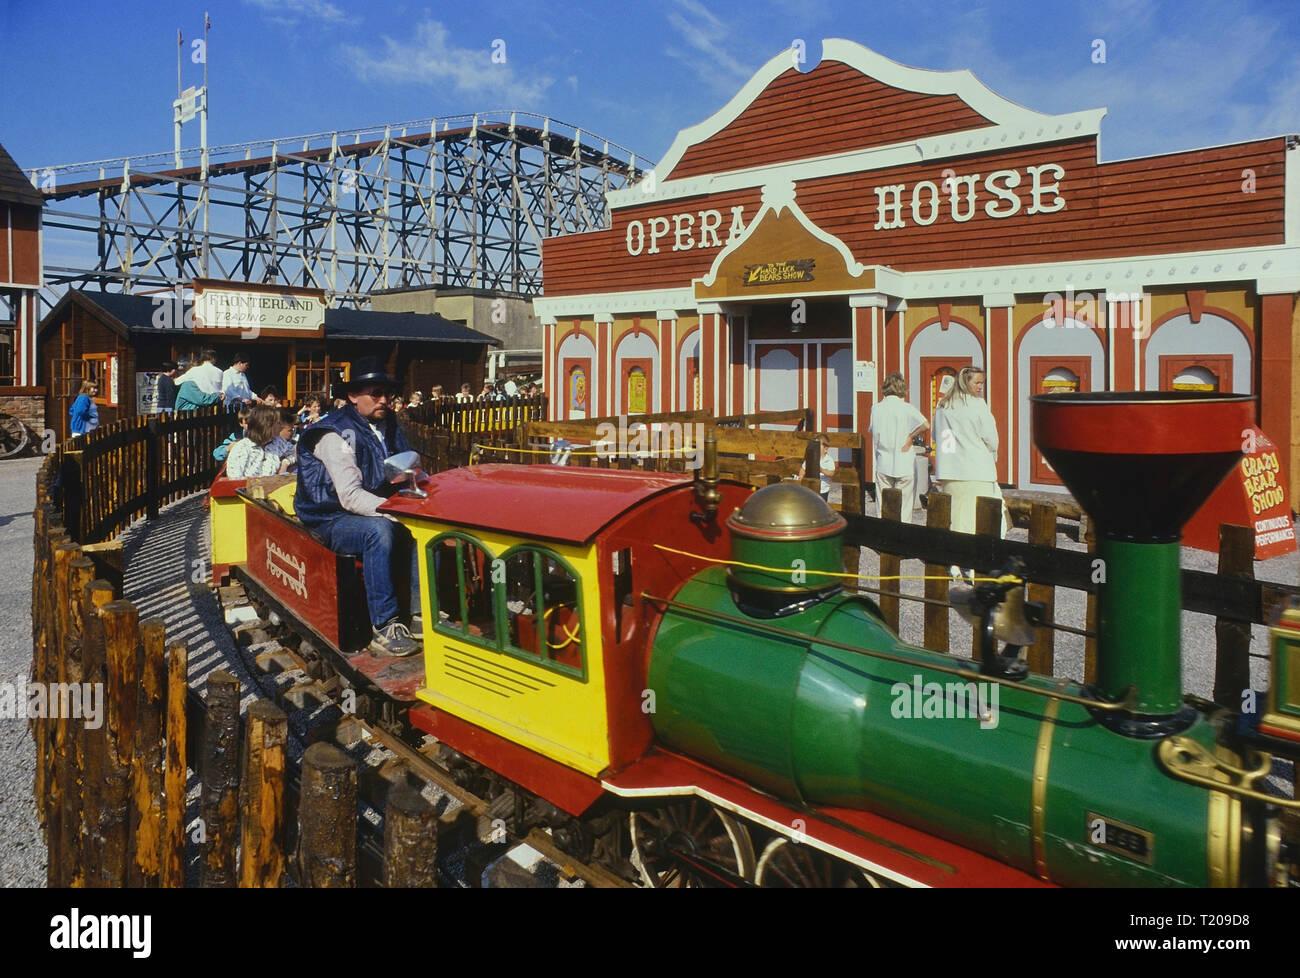 El Paso Railroad miniture railway, Frontierland Western Theme Park, Morecambe, Lancashire, England, UK. Circa 1980's Stock Photo